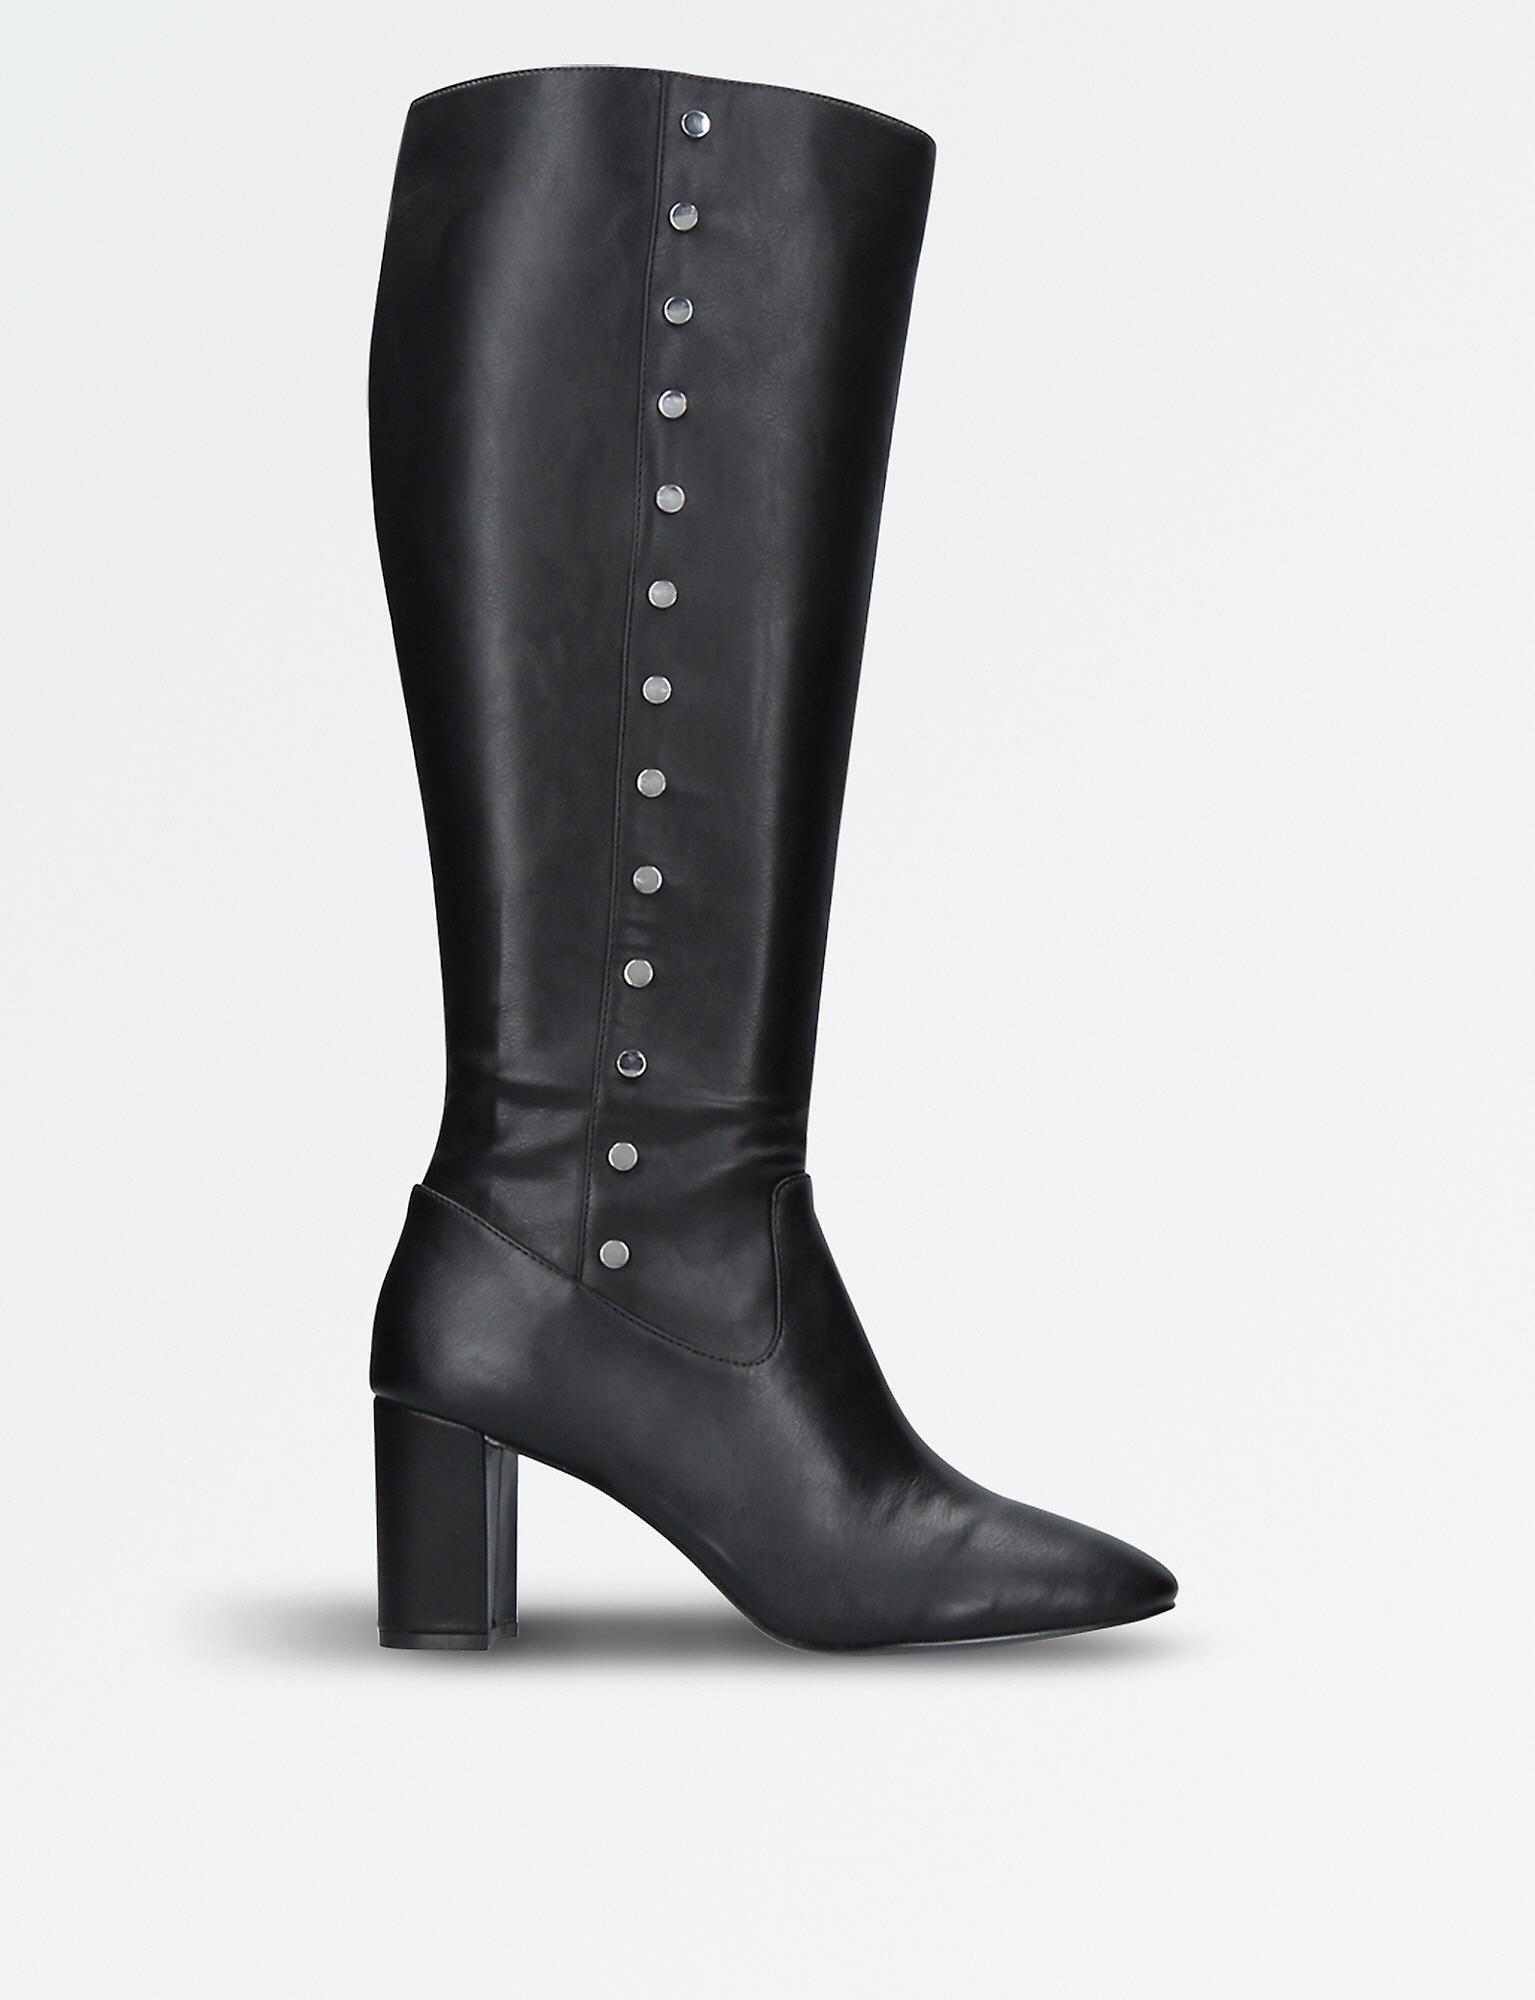 Apparel men bodycon dress knee high boots nine west target xhilaration